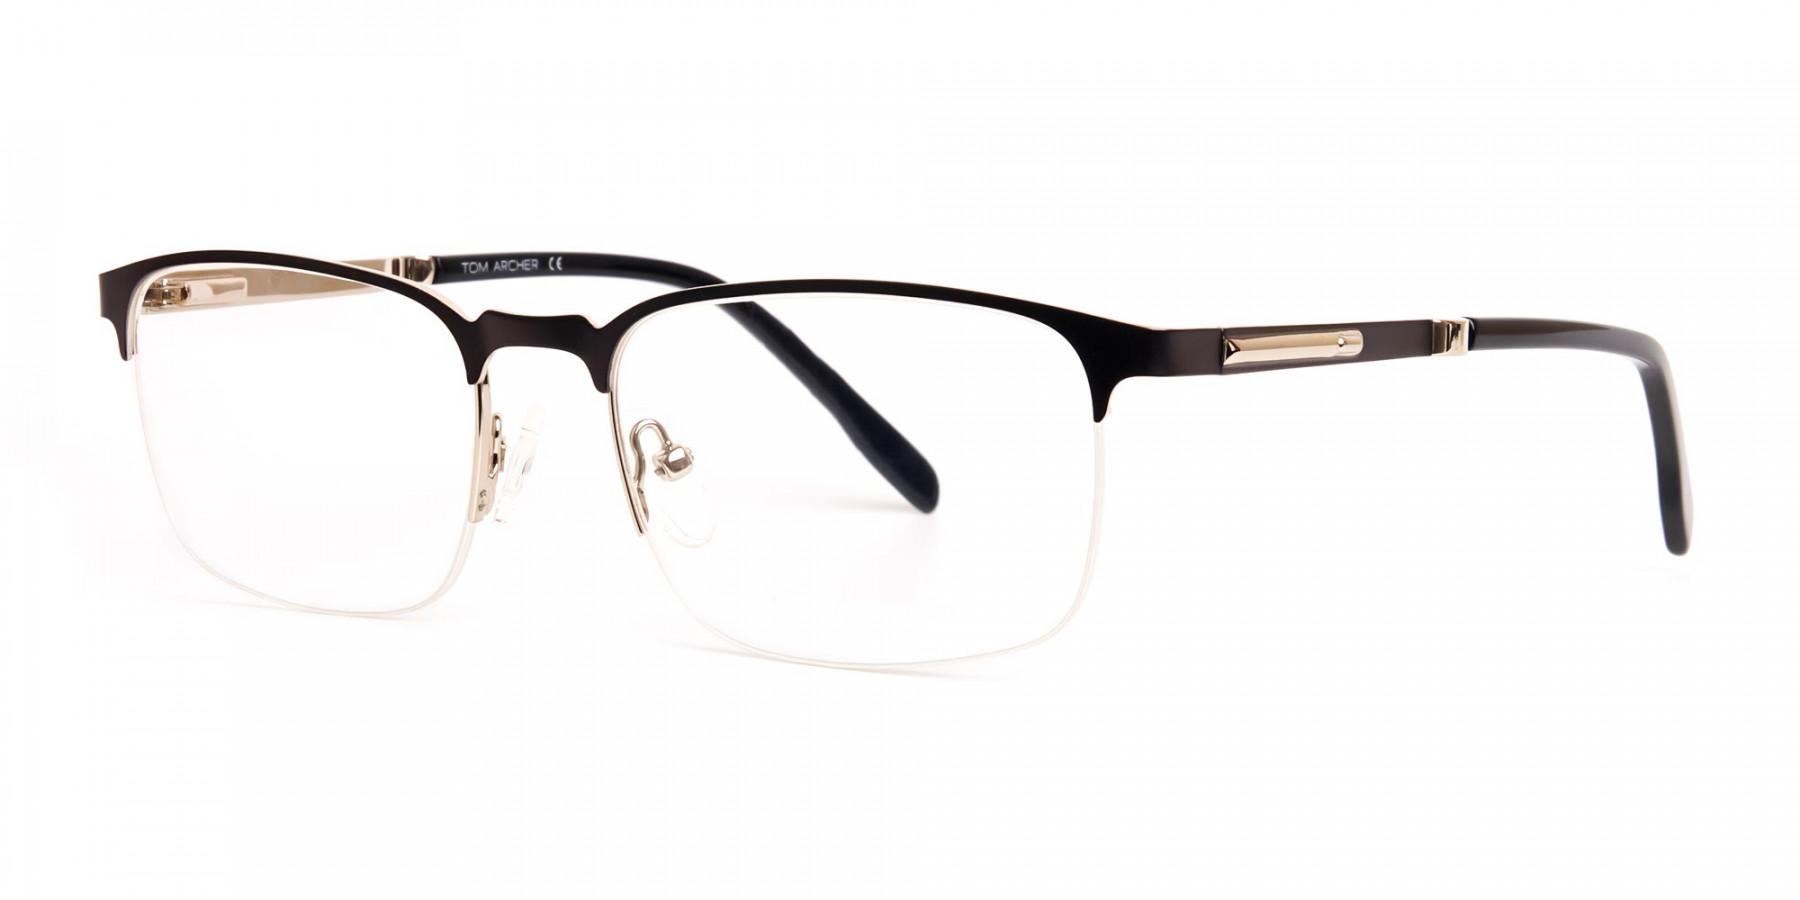 grey-gunmetal-rectangular-half-rim-glasses-frames-1